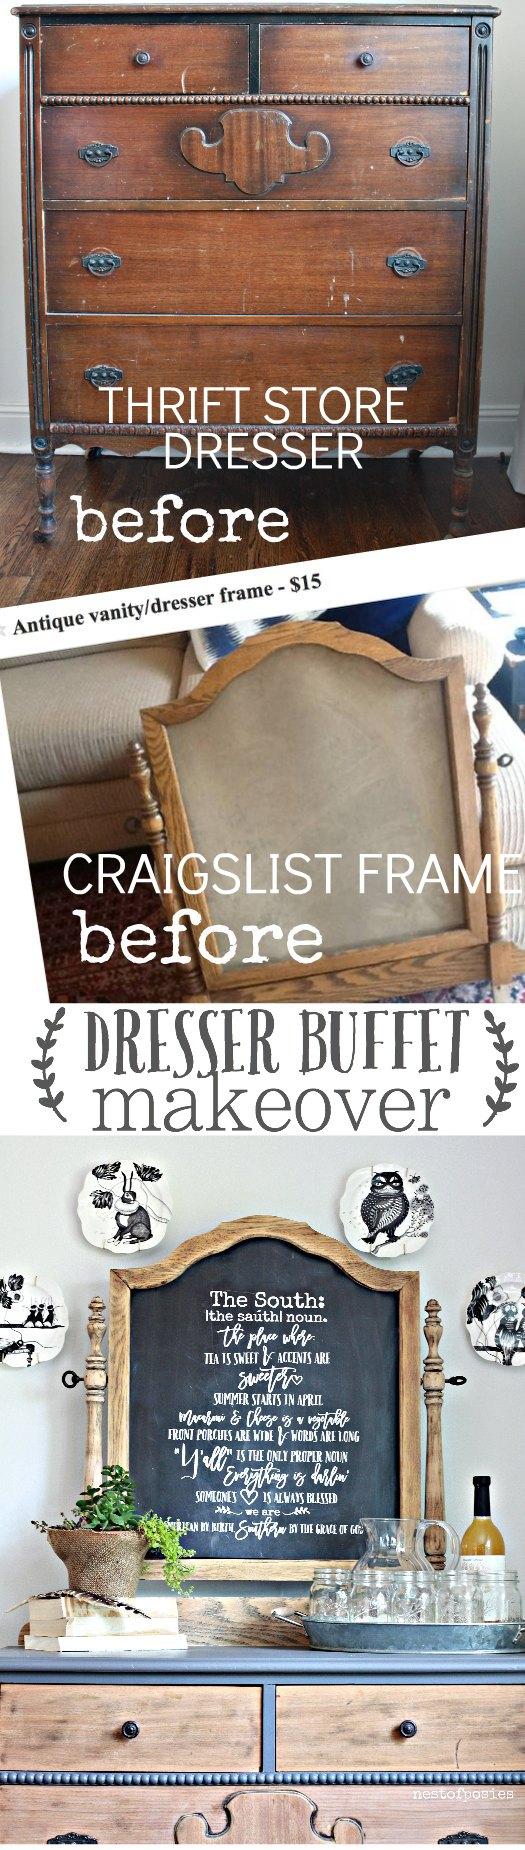 Chalkboard Dresser Buffet - Thrifty under $50!